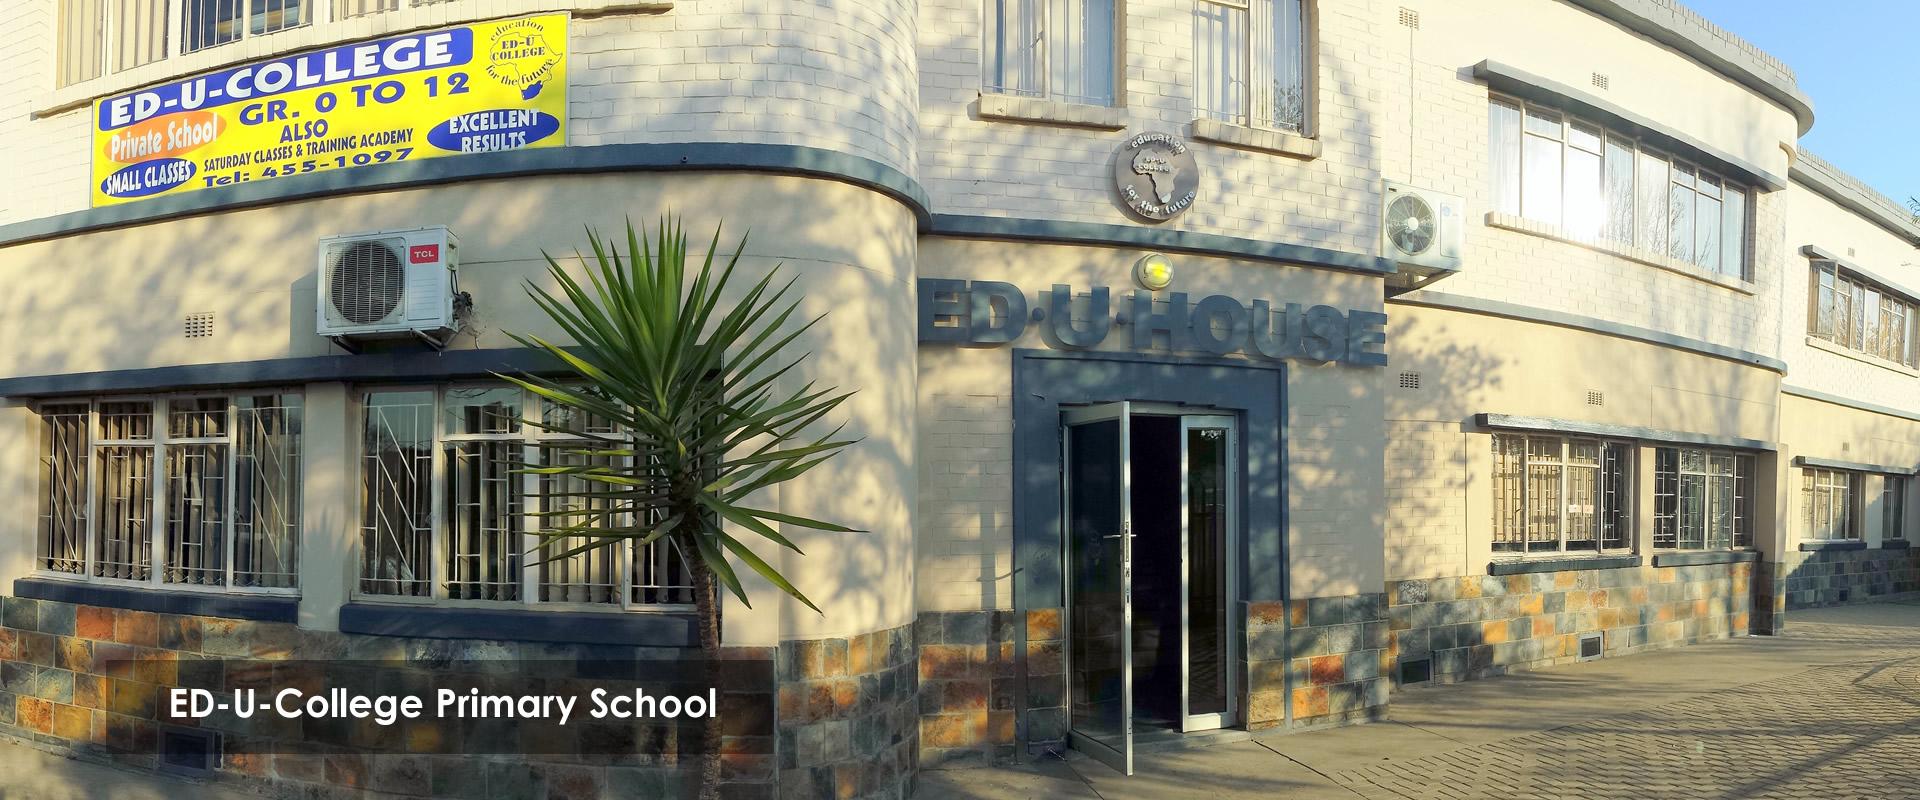 ed-u-college-primaryschool